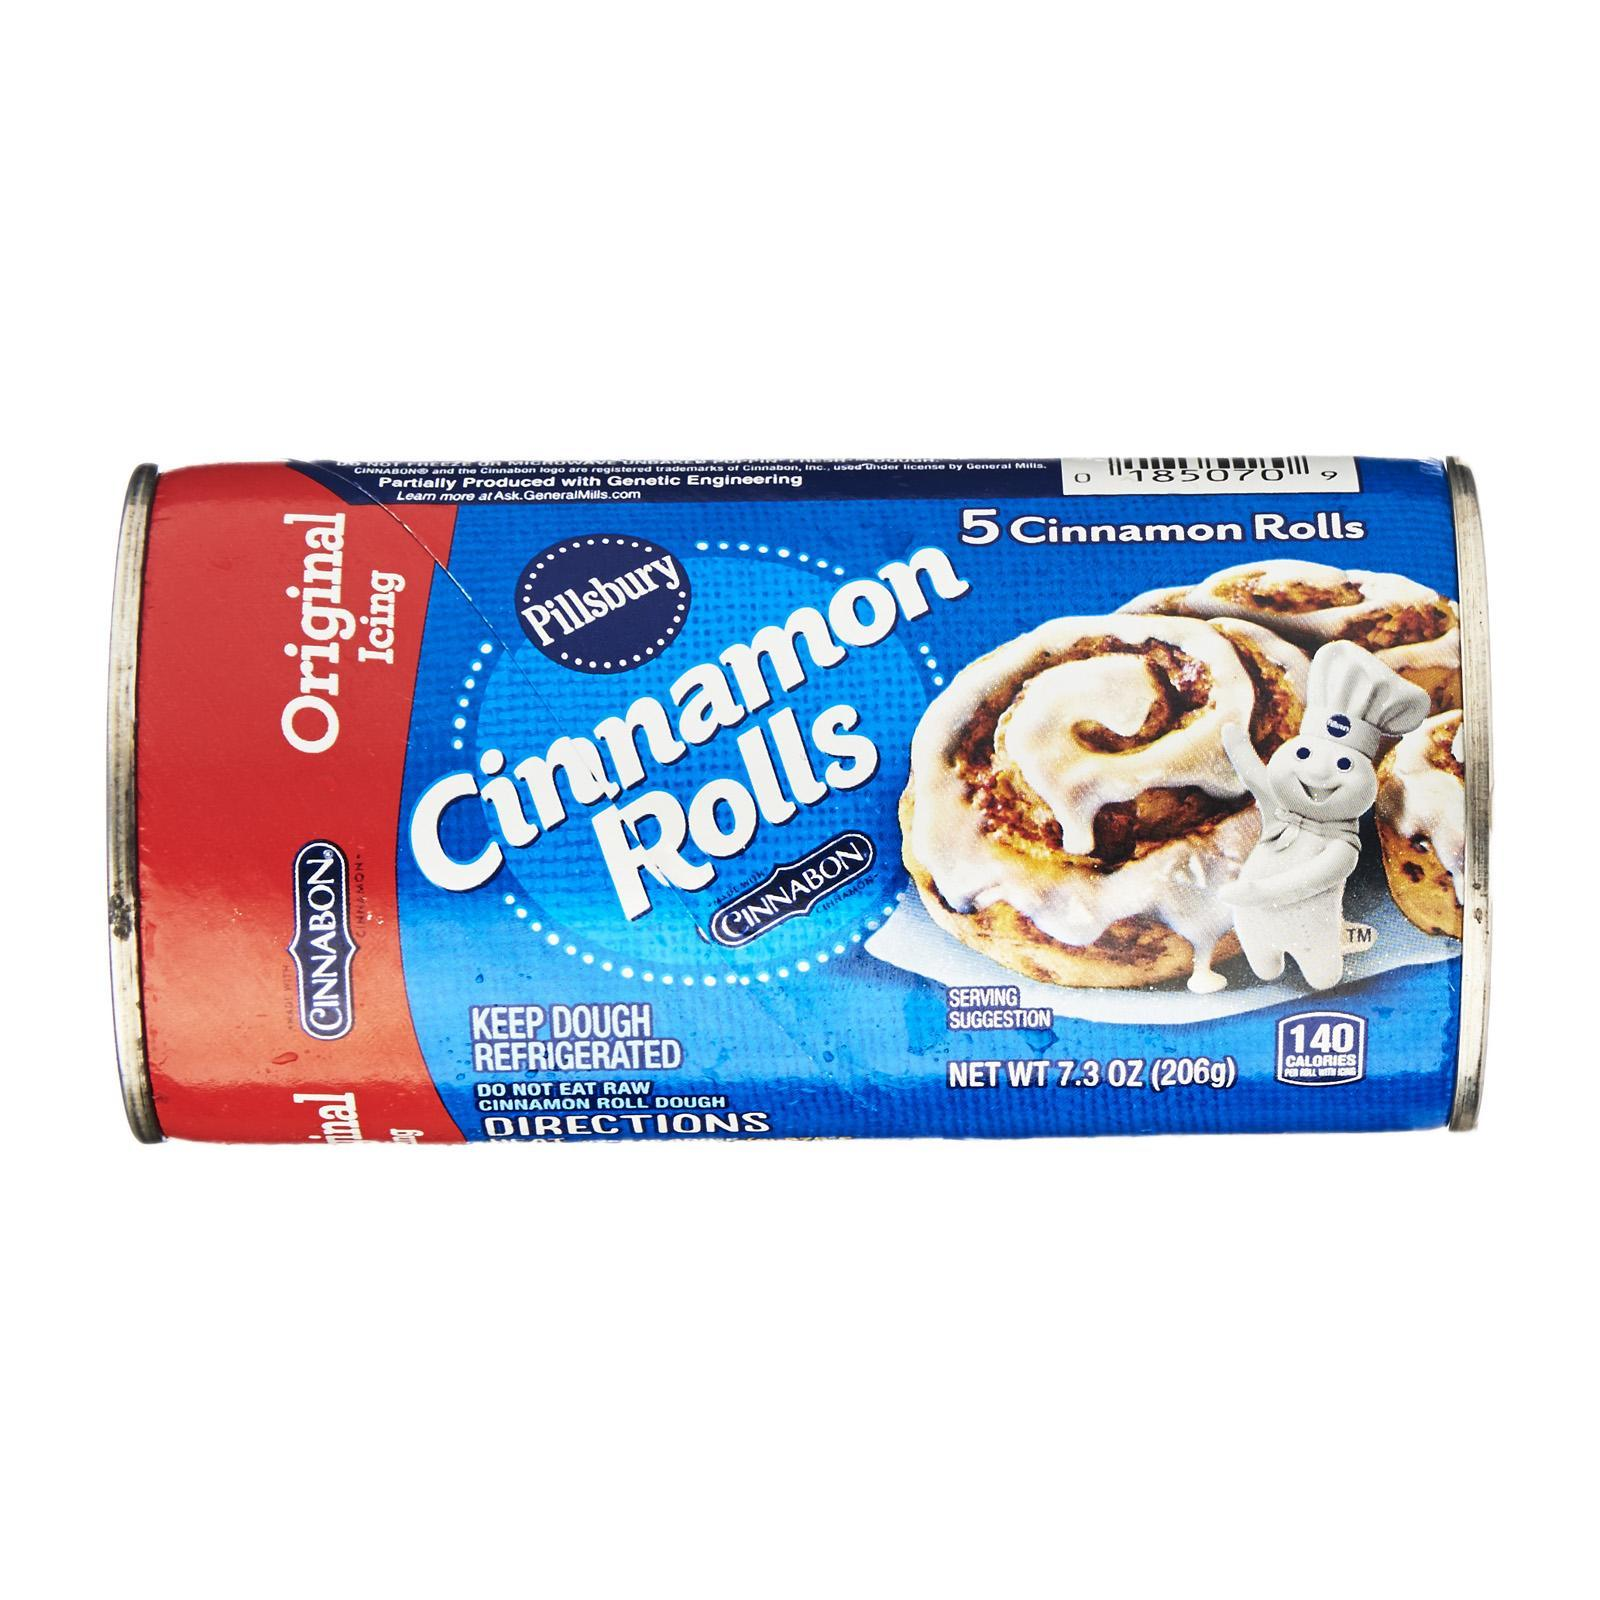 Pillsbury Chilled Cinnomon Rolls With Icing By Redmart.